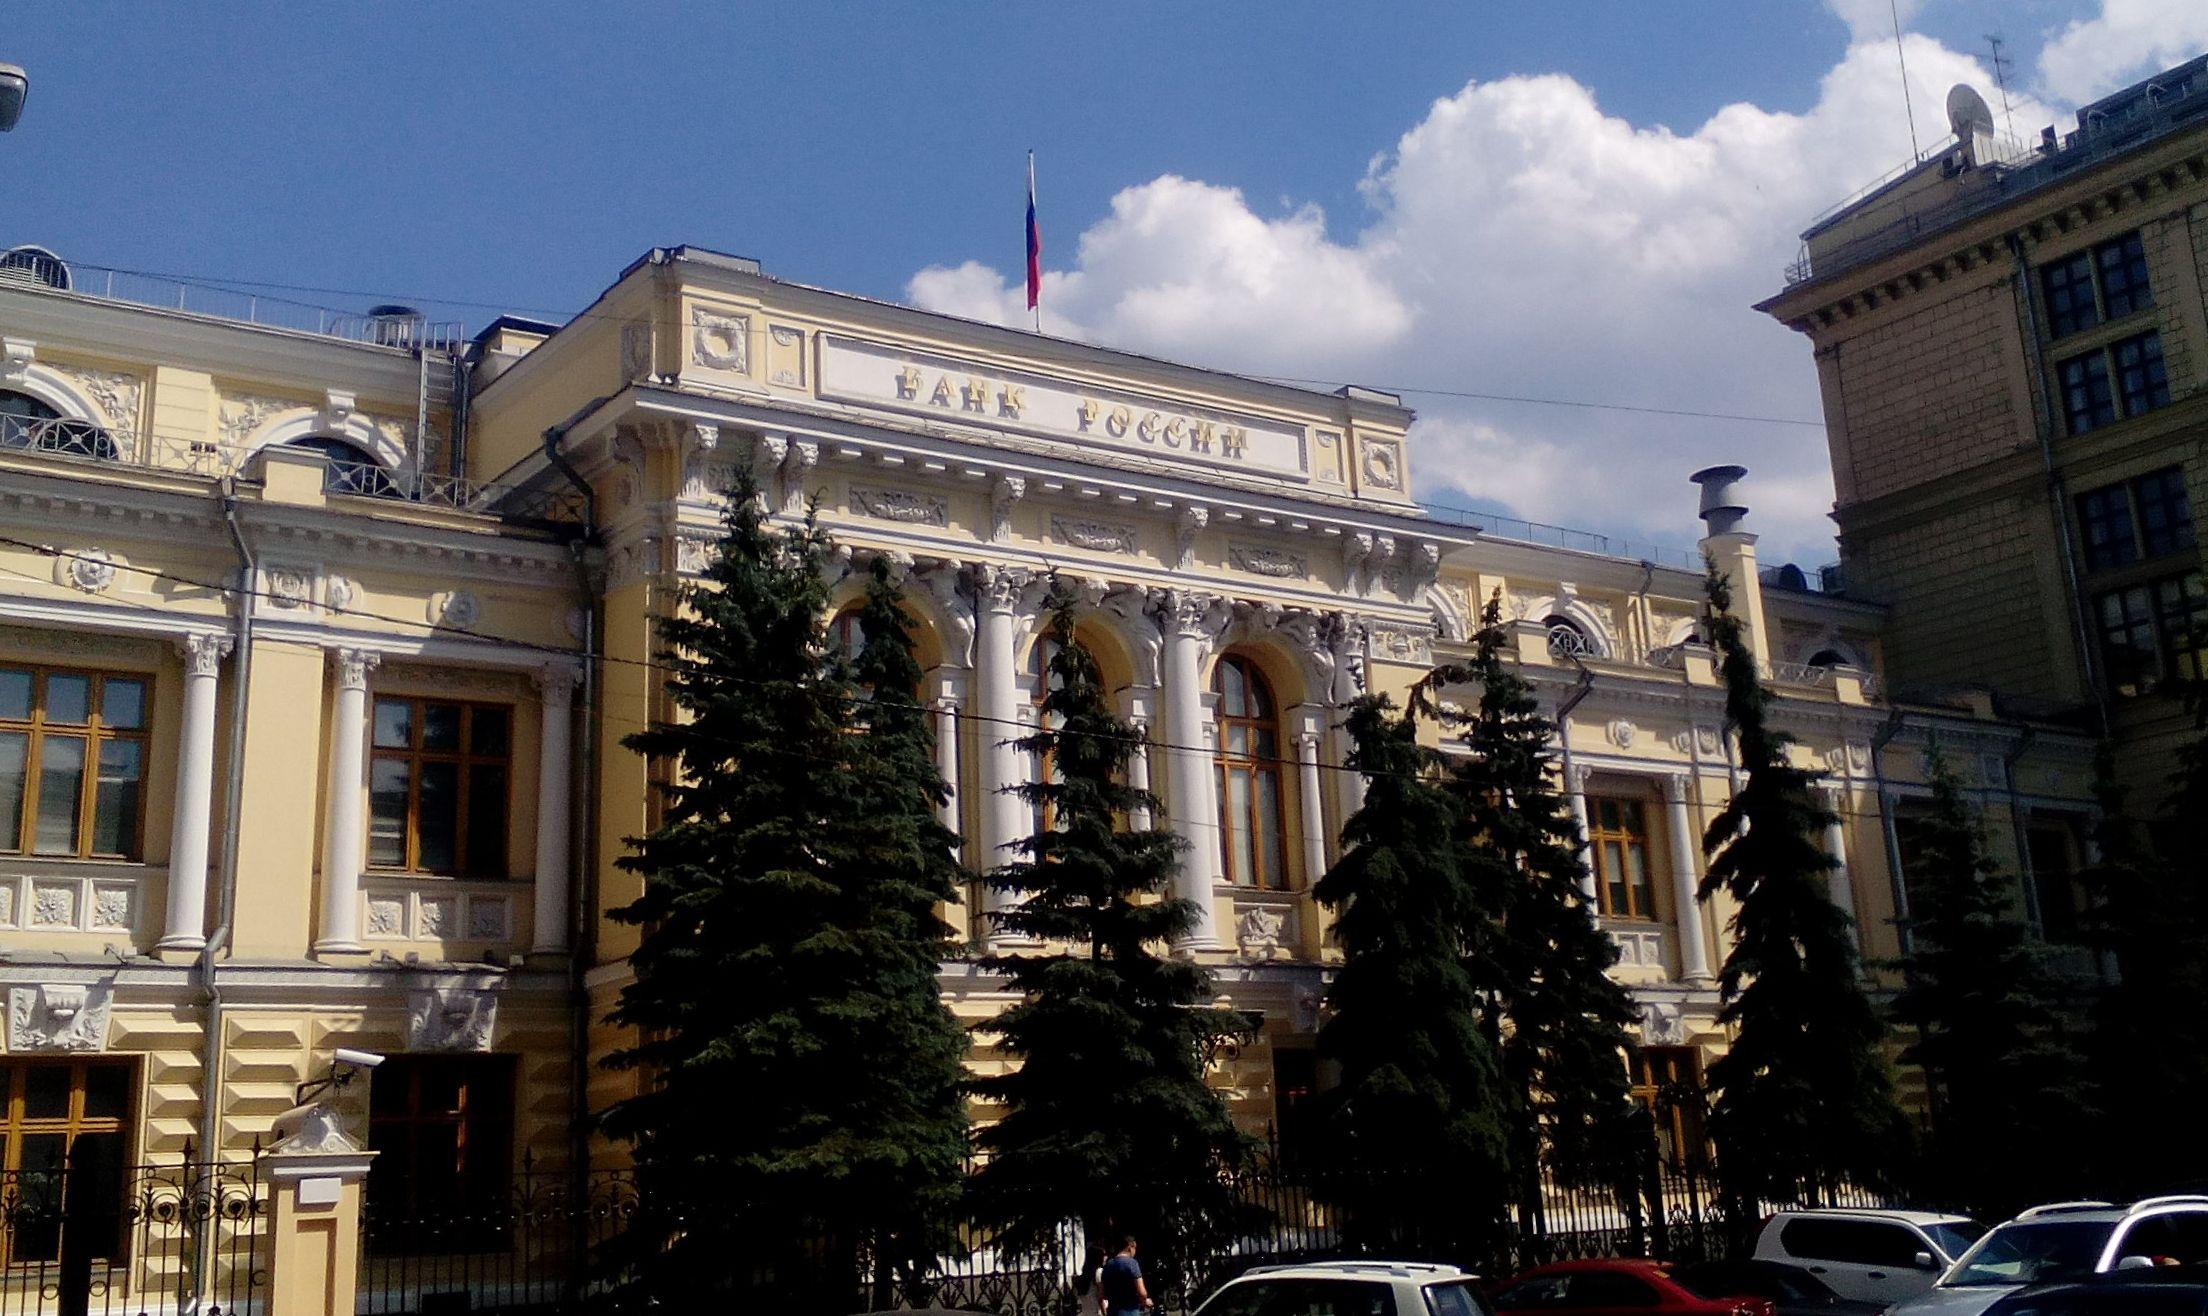 Nettokapitalabfluss aus Russland fast verdoppelt